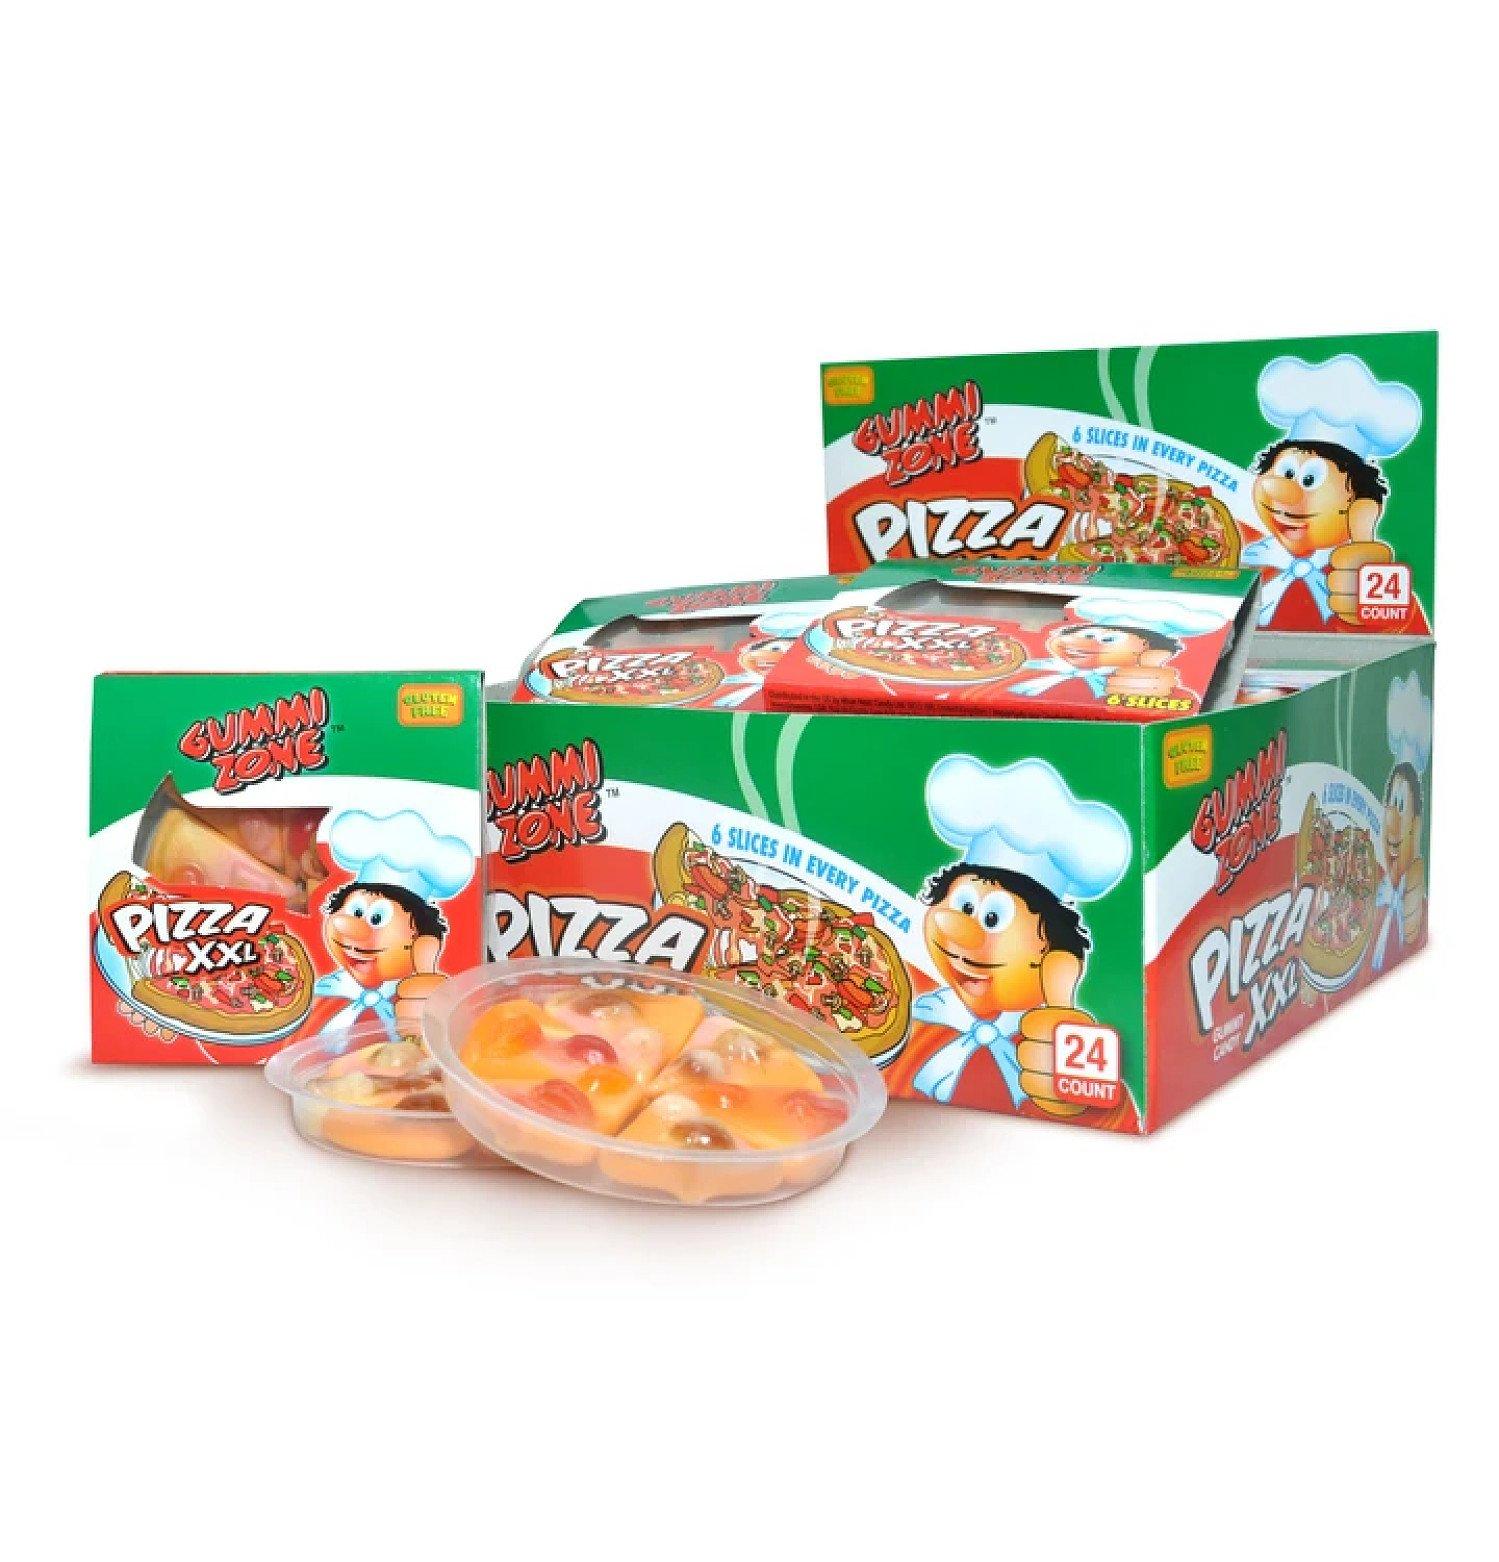 GUMMY PIZZAS (GUMMI ZONE) 24 COUNT Free Postage